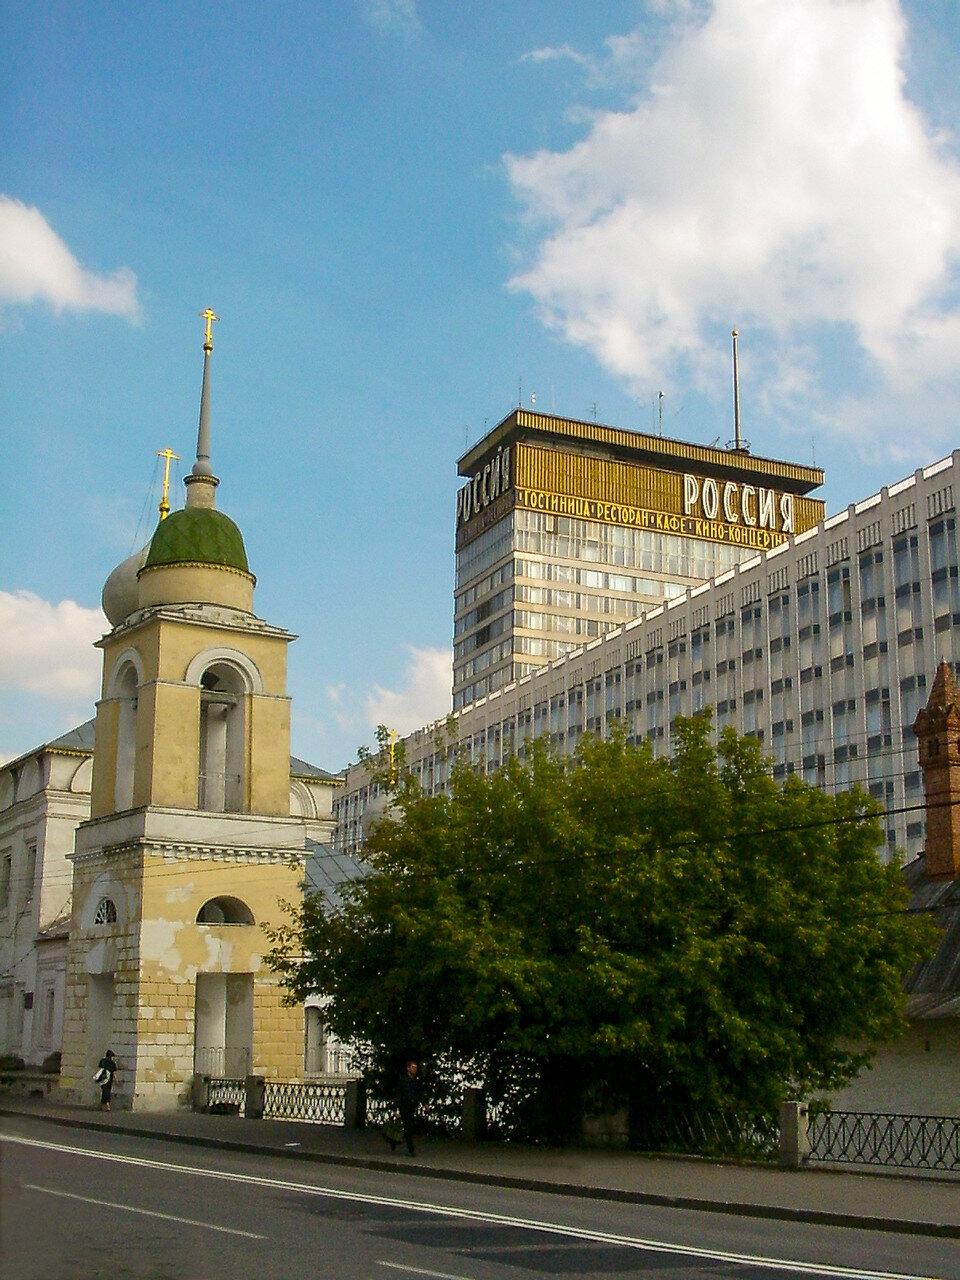 Гостиница-Россия.jpg